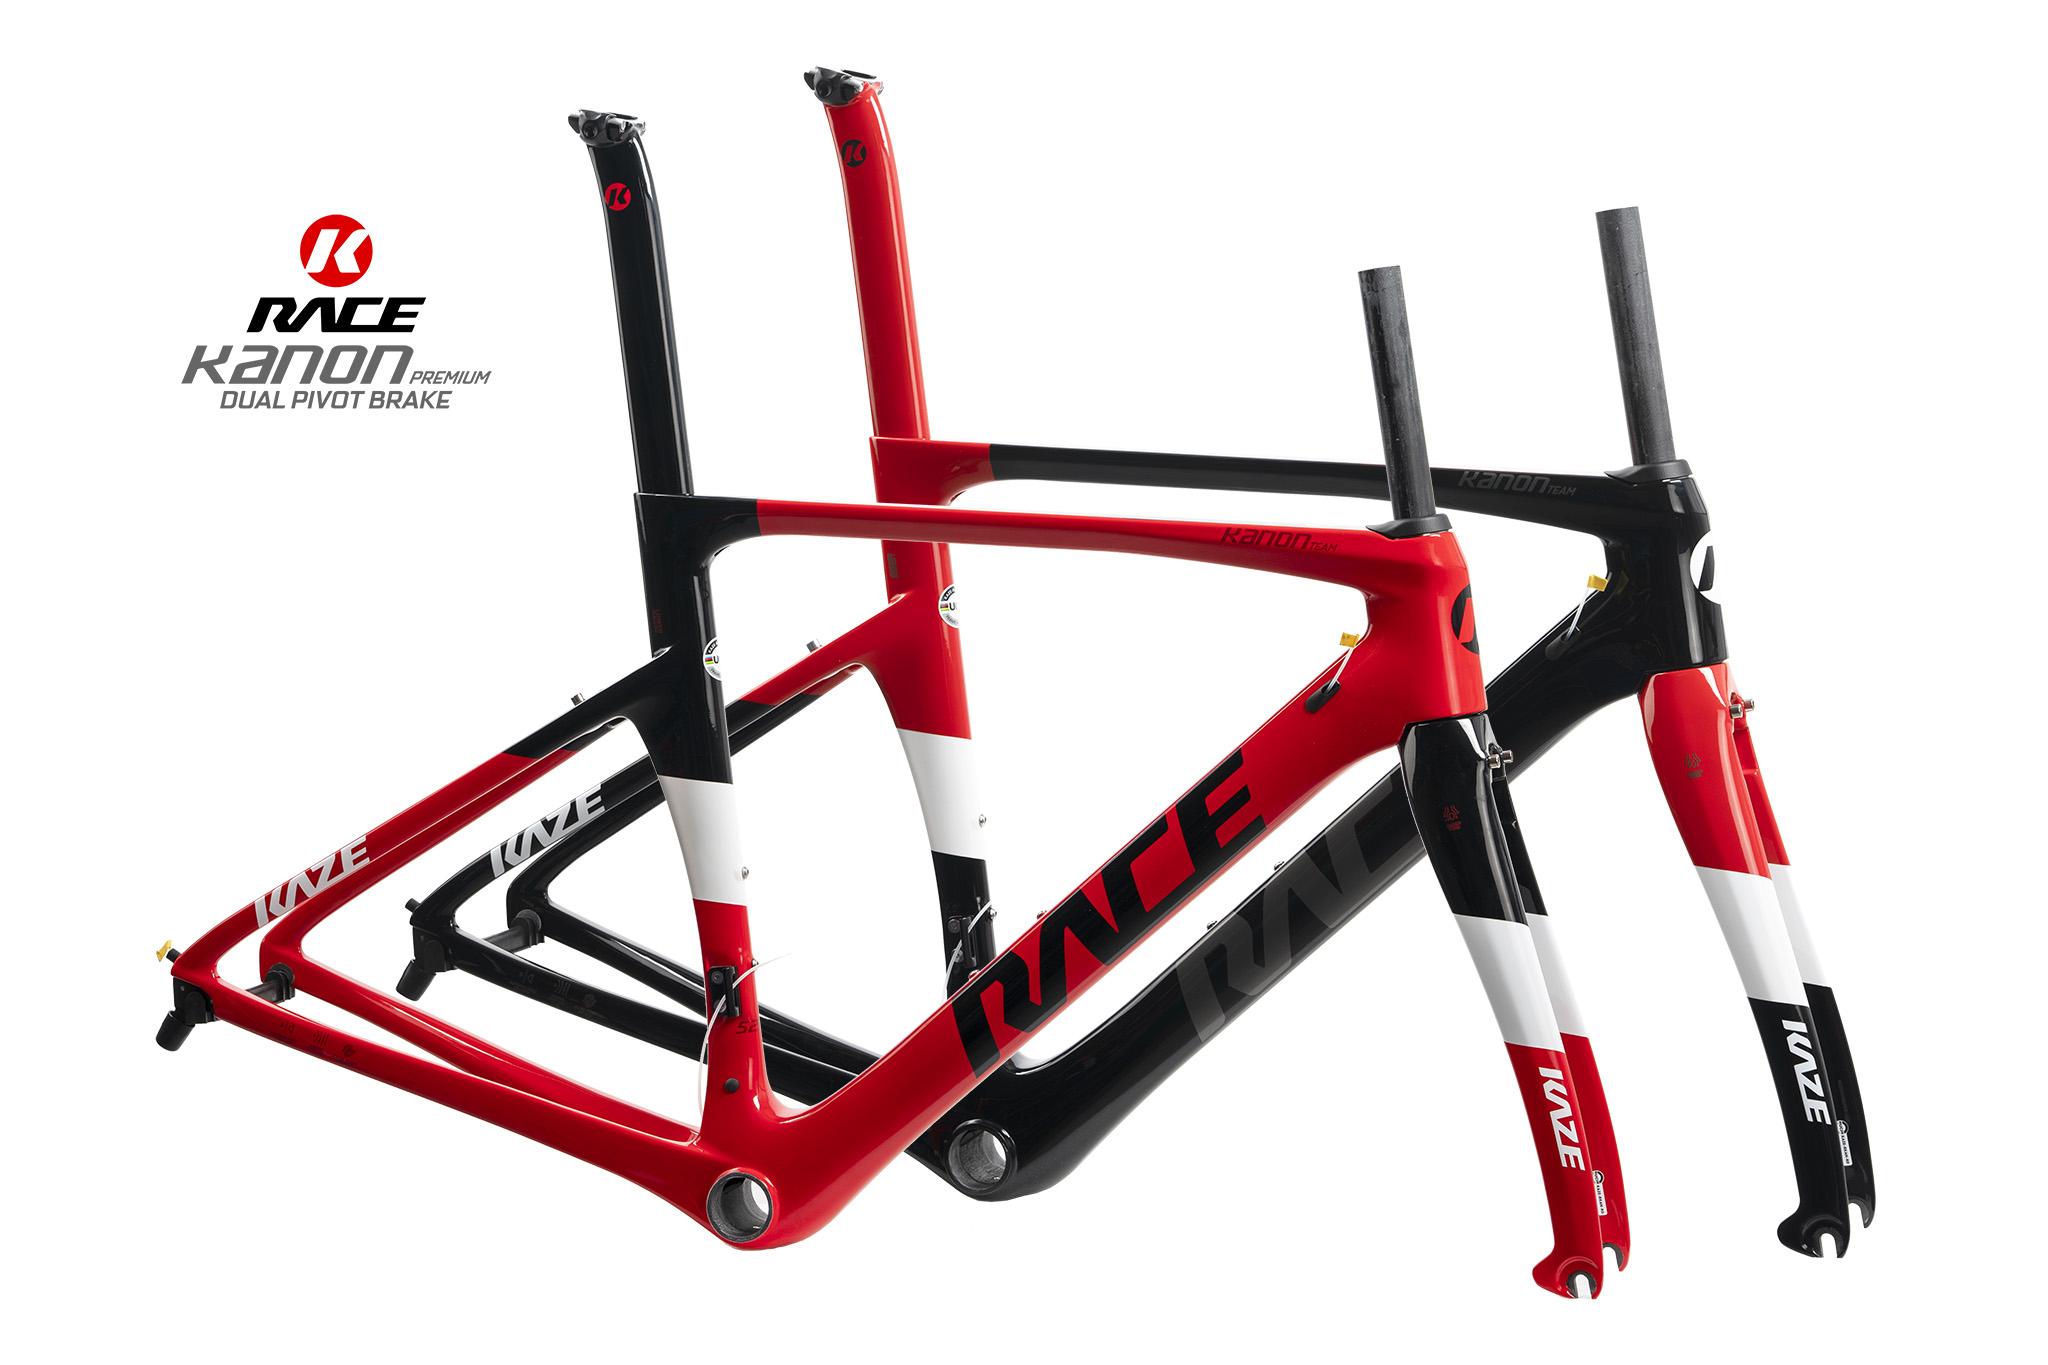 KAZE RACE | KANON Team (Frame set) Direct mount